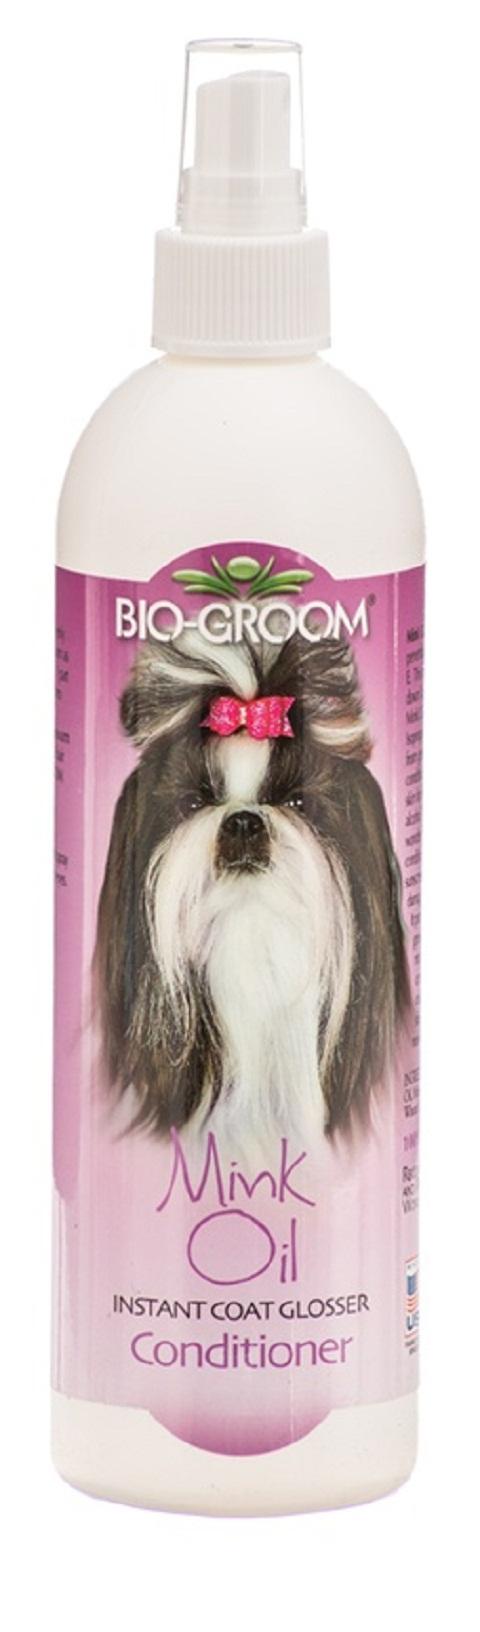 Bio-groom Mink Oil – Био-грум норковое масло для собак (355 мл)